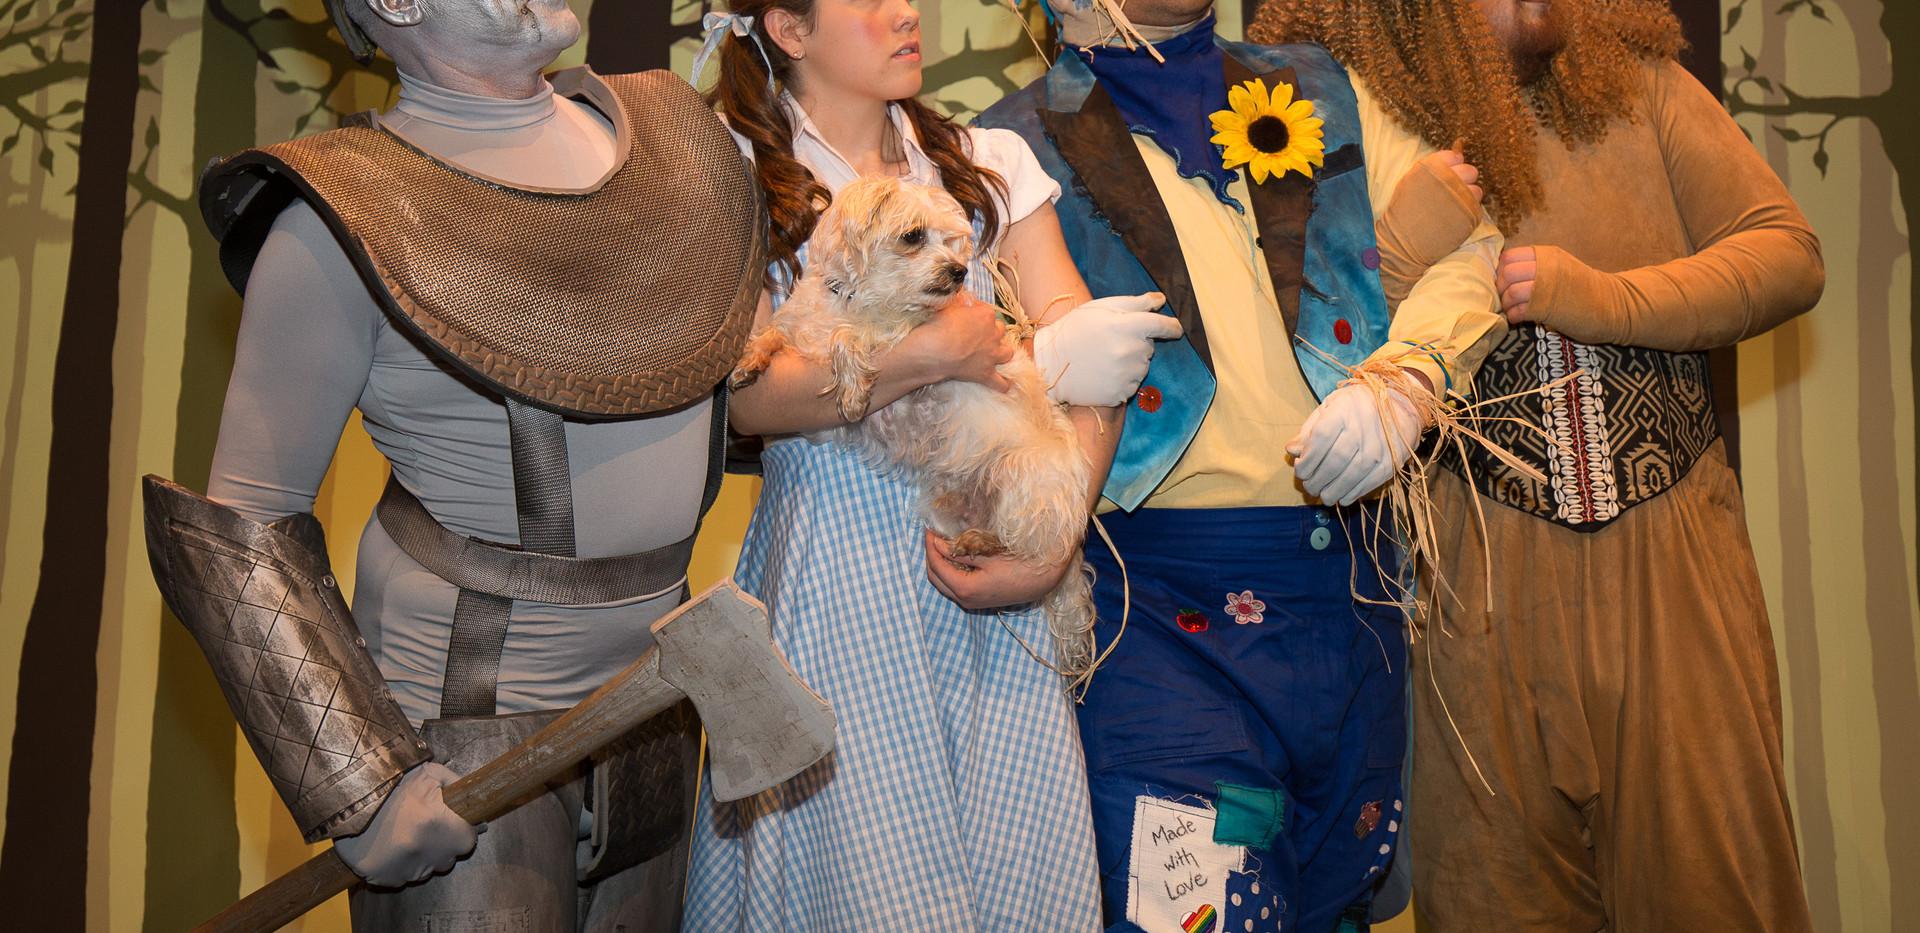 2017 The Wizard of Oz 05.jpg